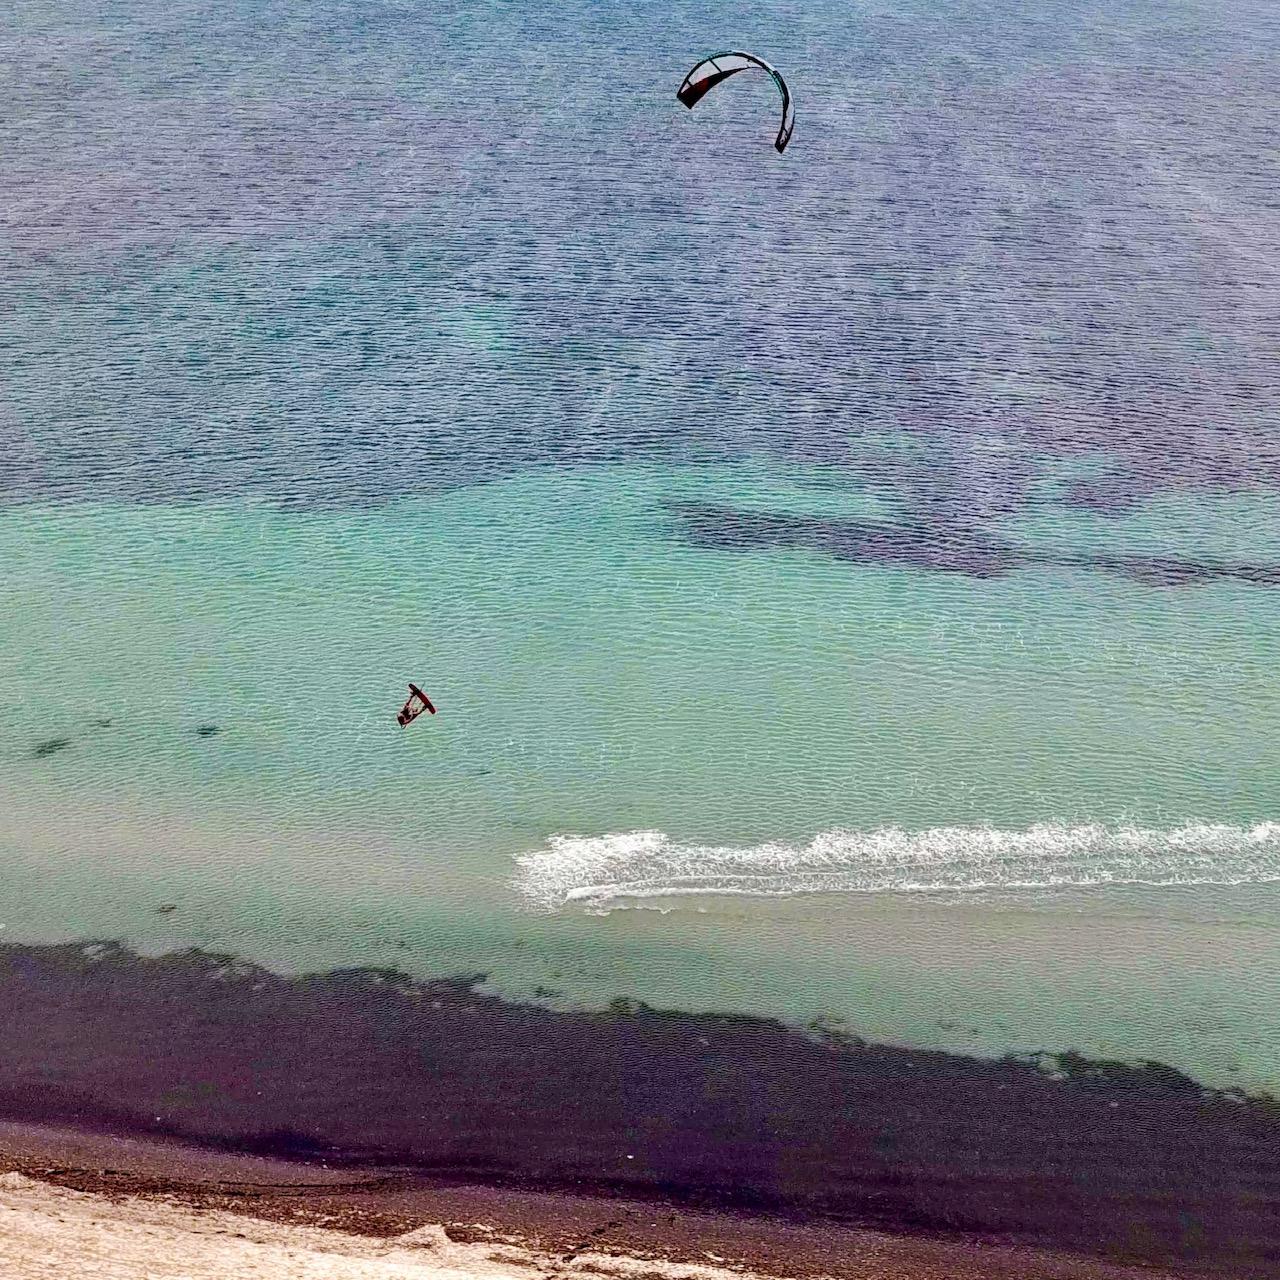 kitesurfing spot italy, kitesurfing spots europe, europejskie spoty kitesurfingowe